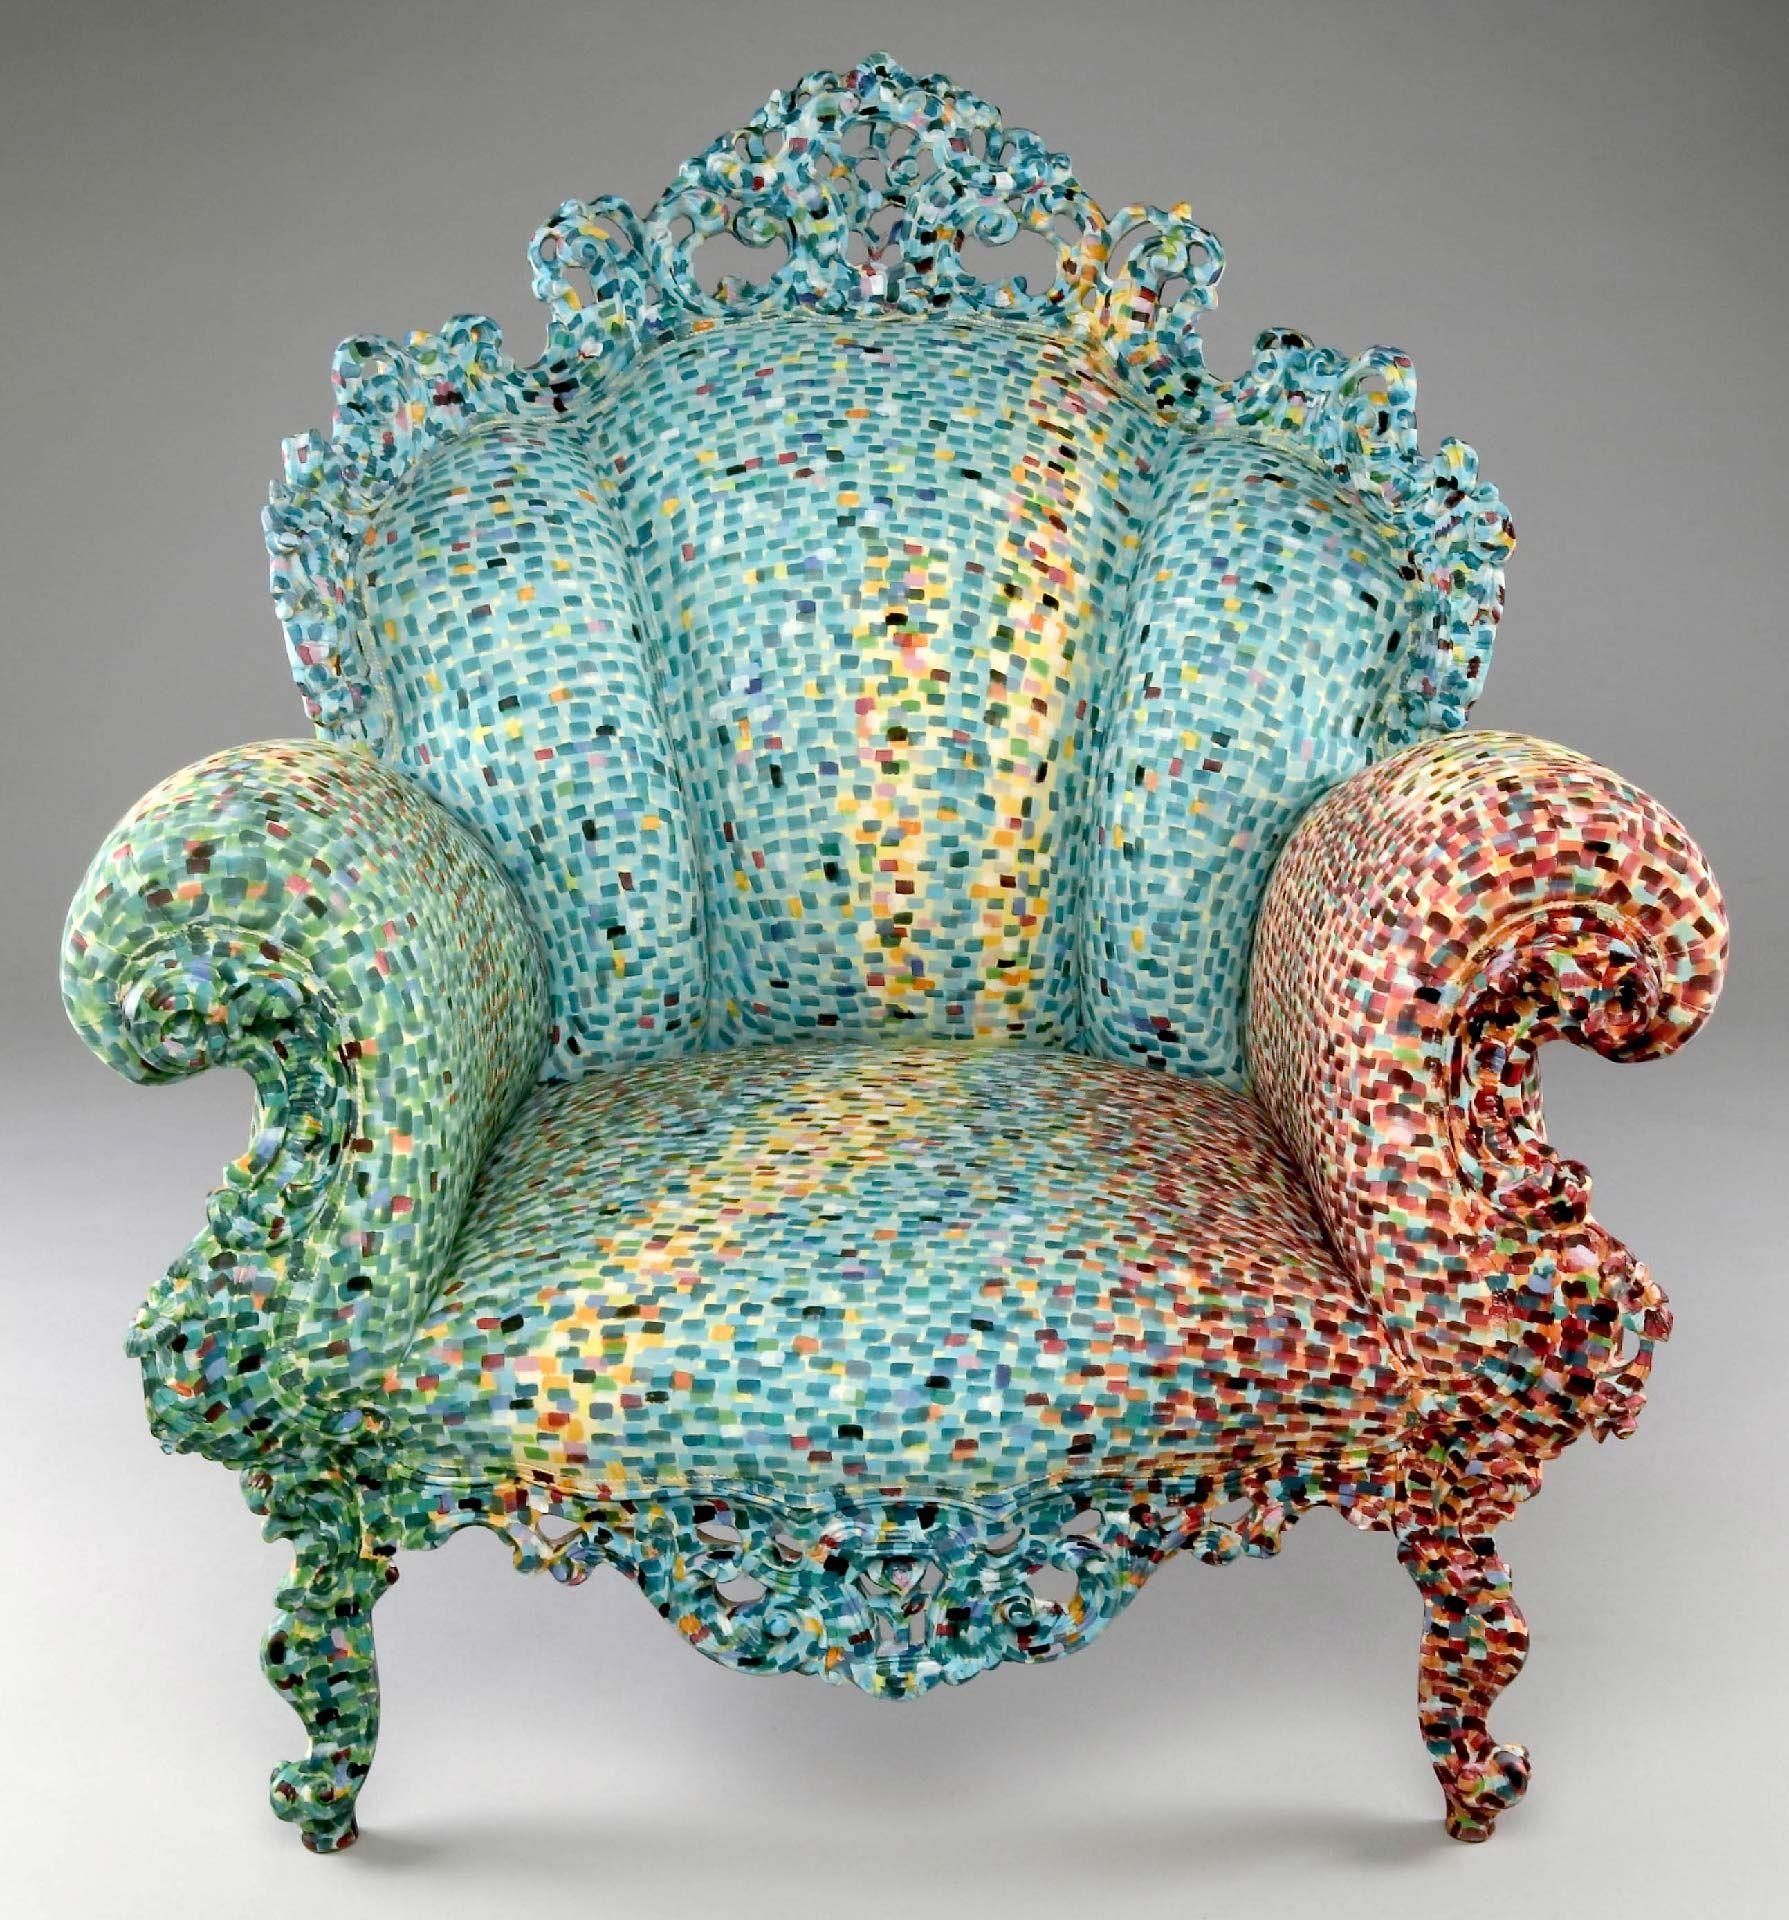 Poltrona di Proust [Proust's Armchair]